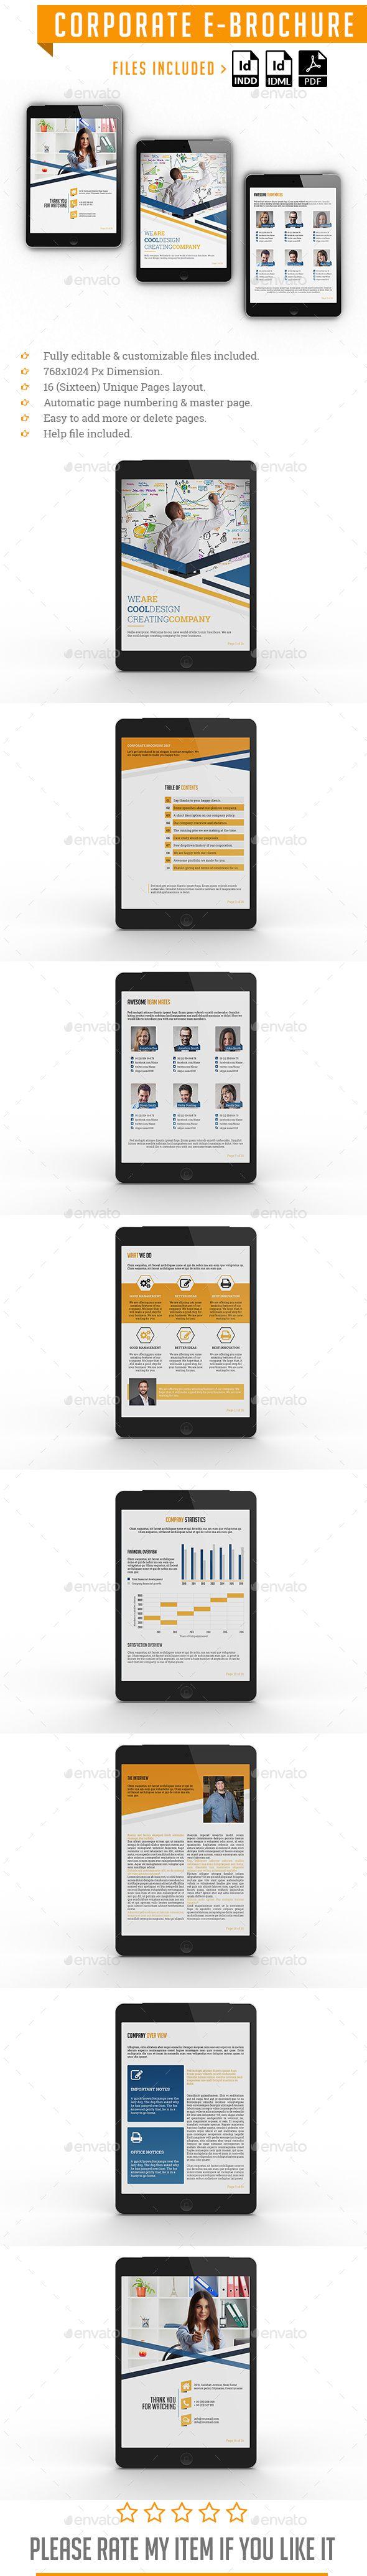 corporate e brochure epublishing e publishing templates